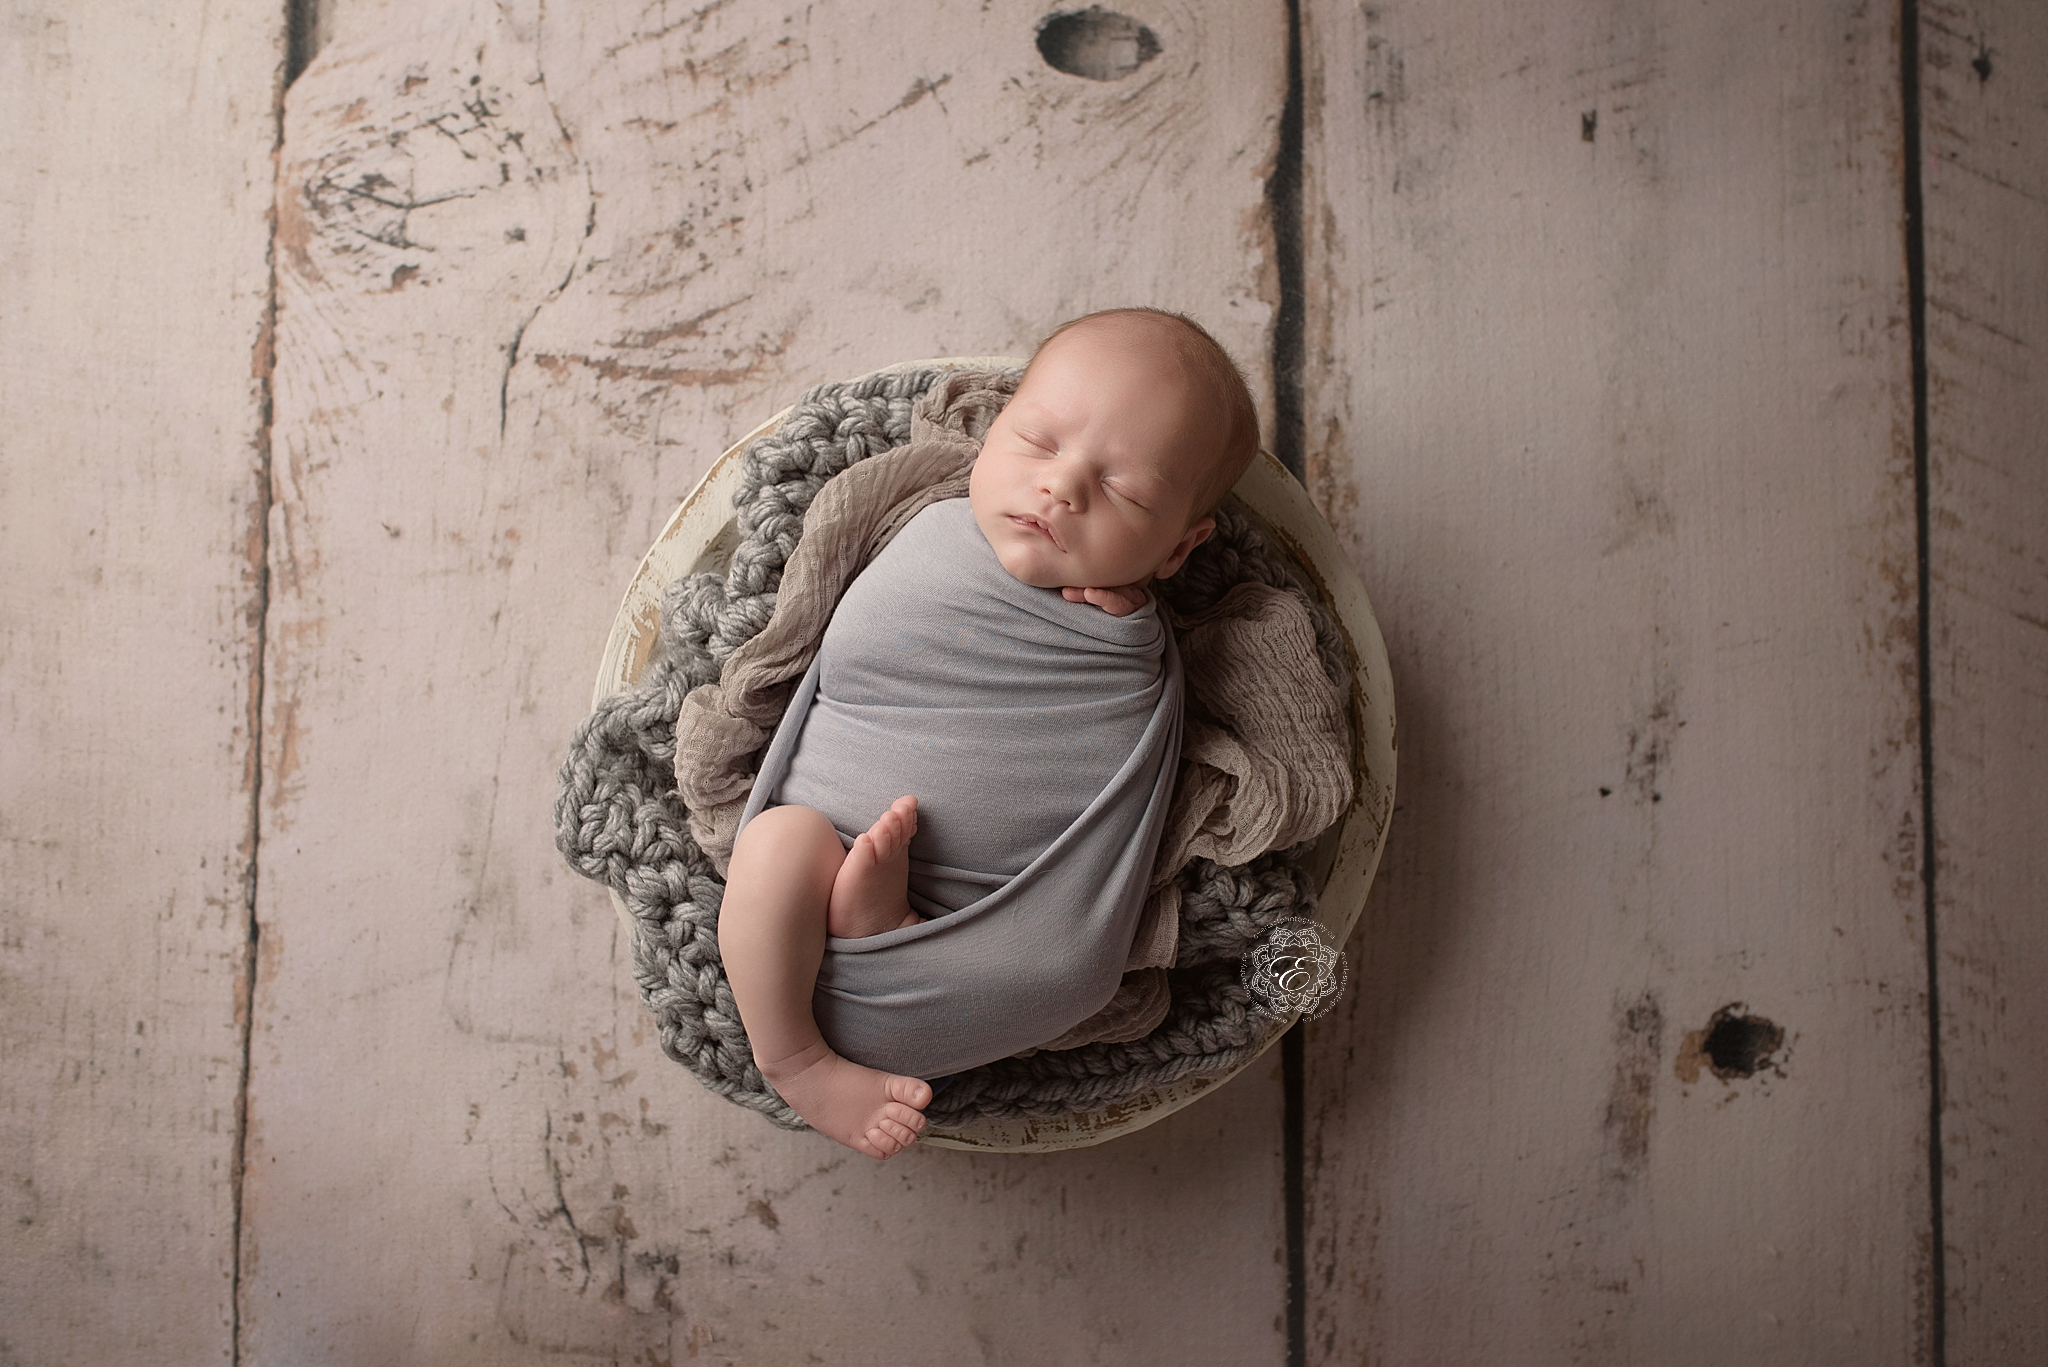 edmonton-posed-newborn-photography.jpg